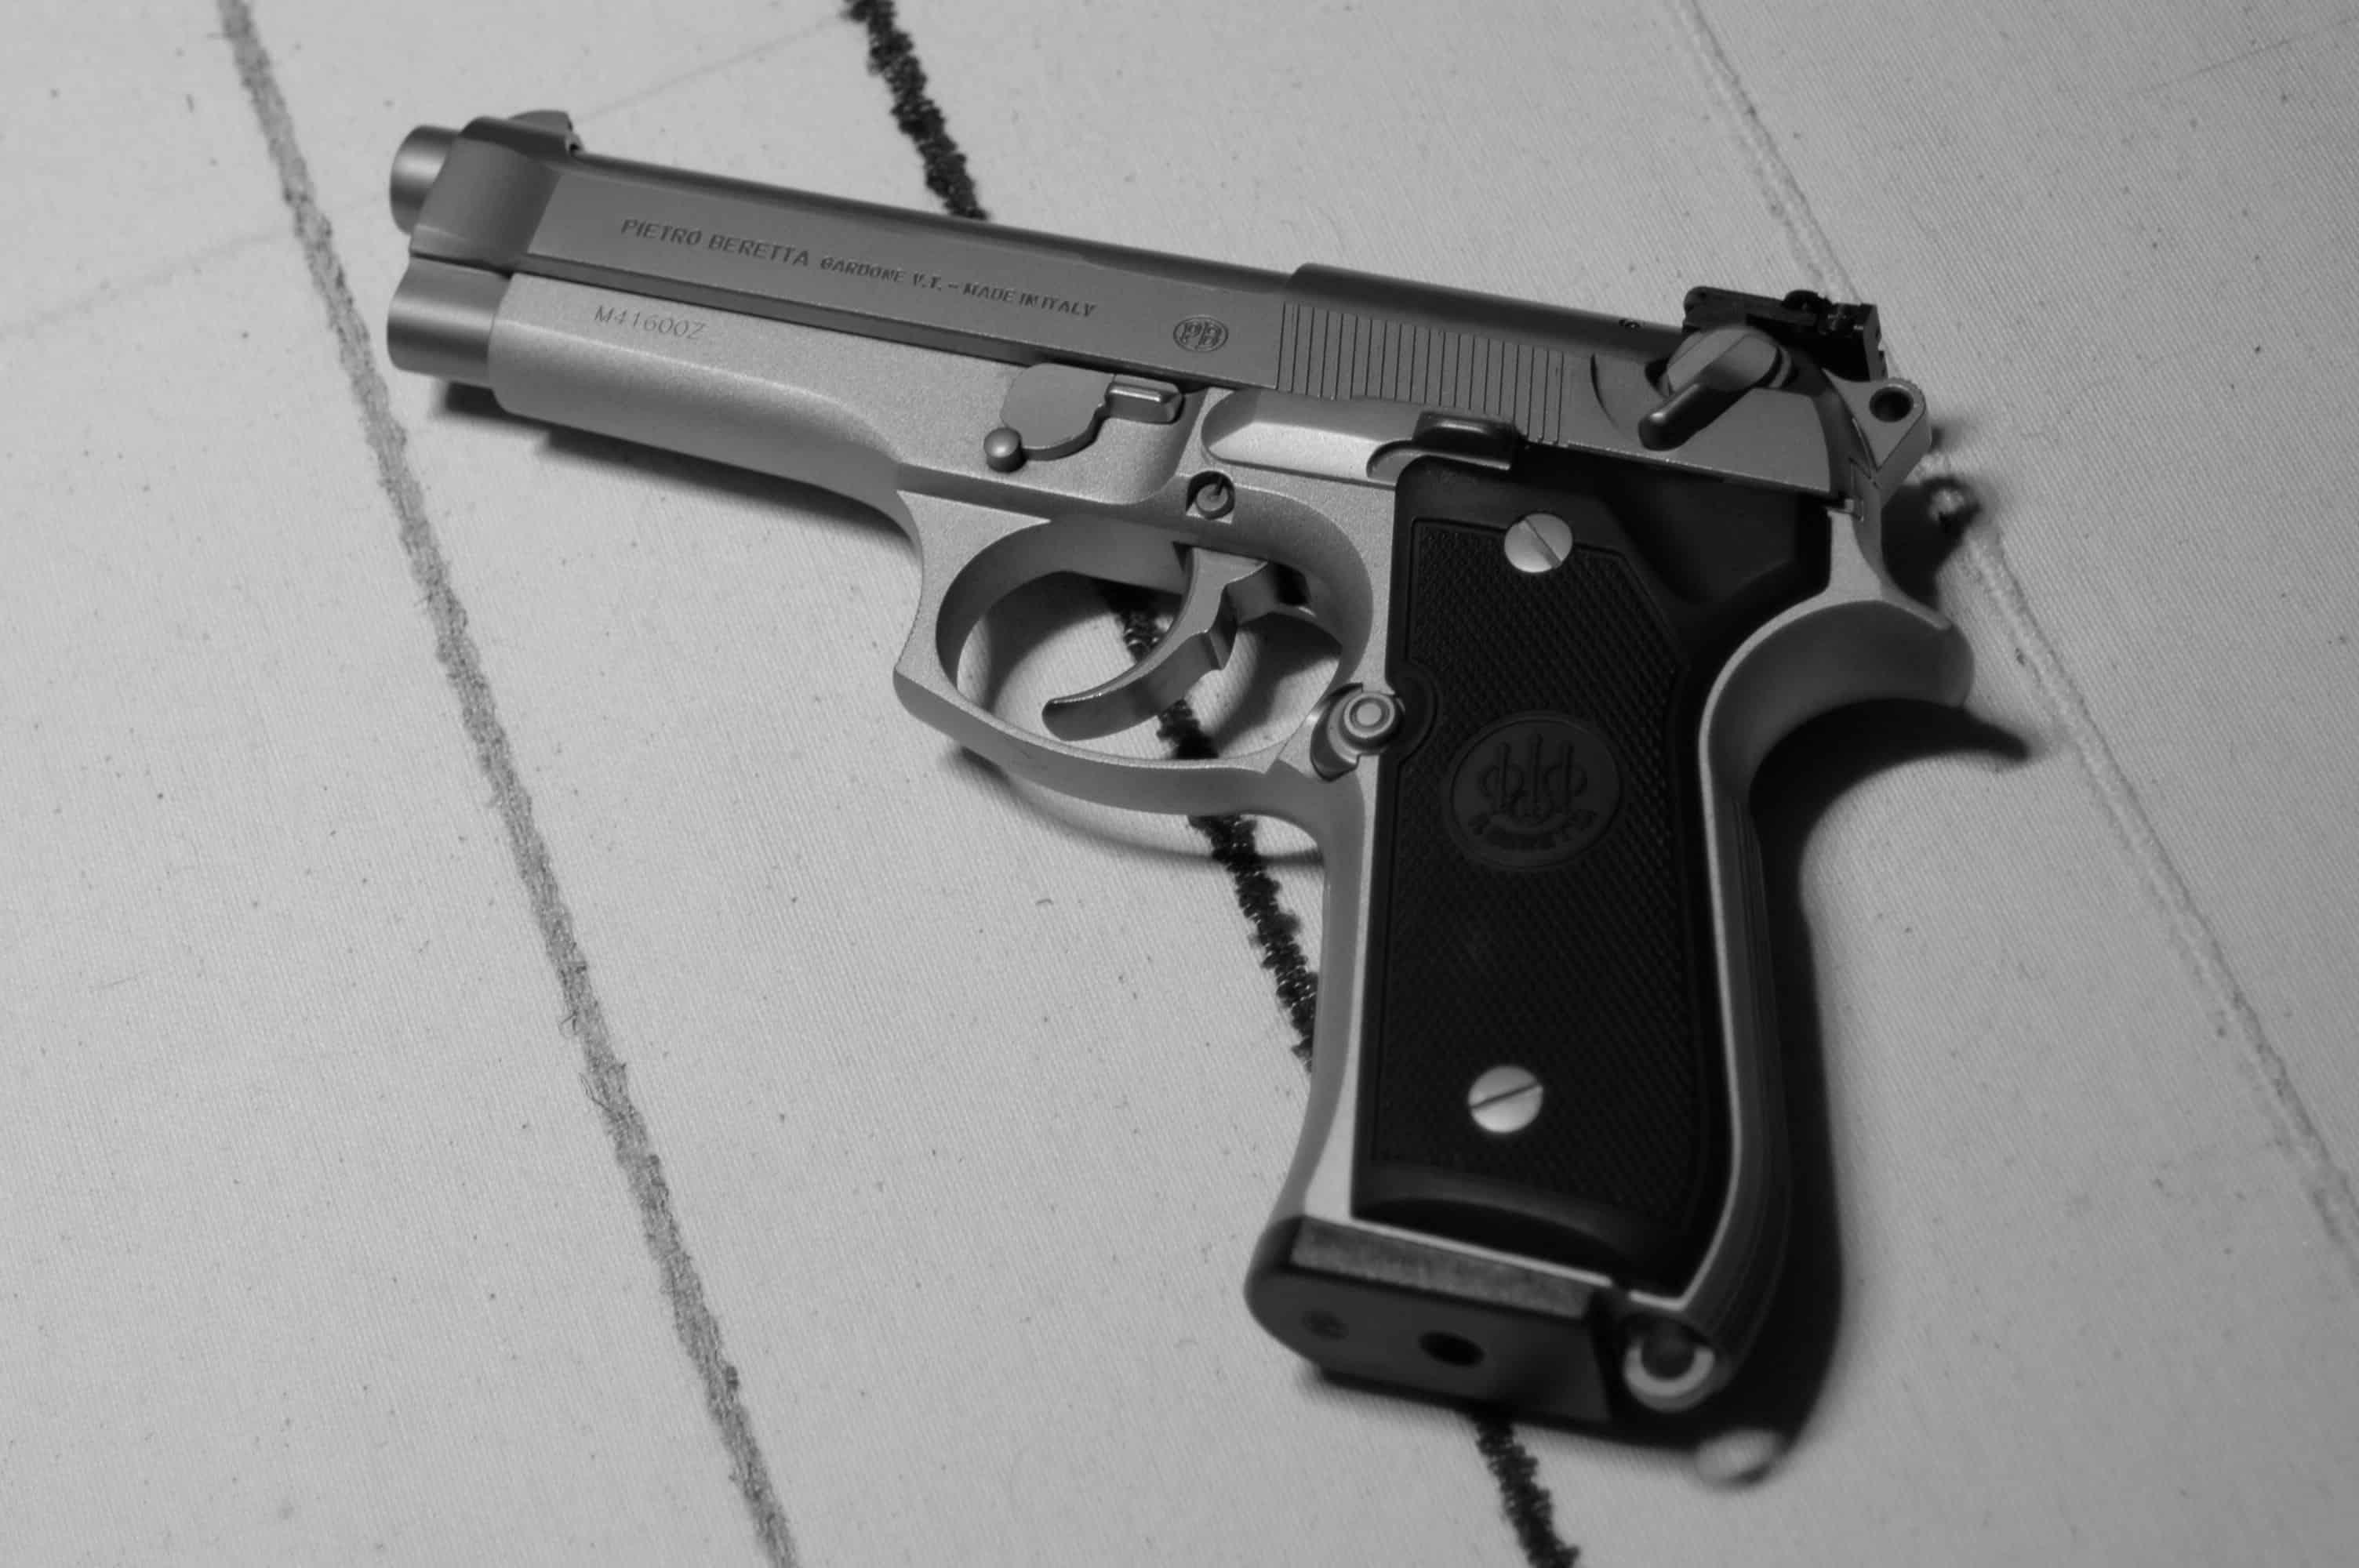 Top 10 9mm Handguns All Time Glock Sig Beretta Who S The Best